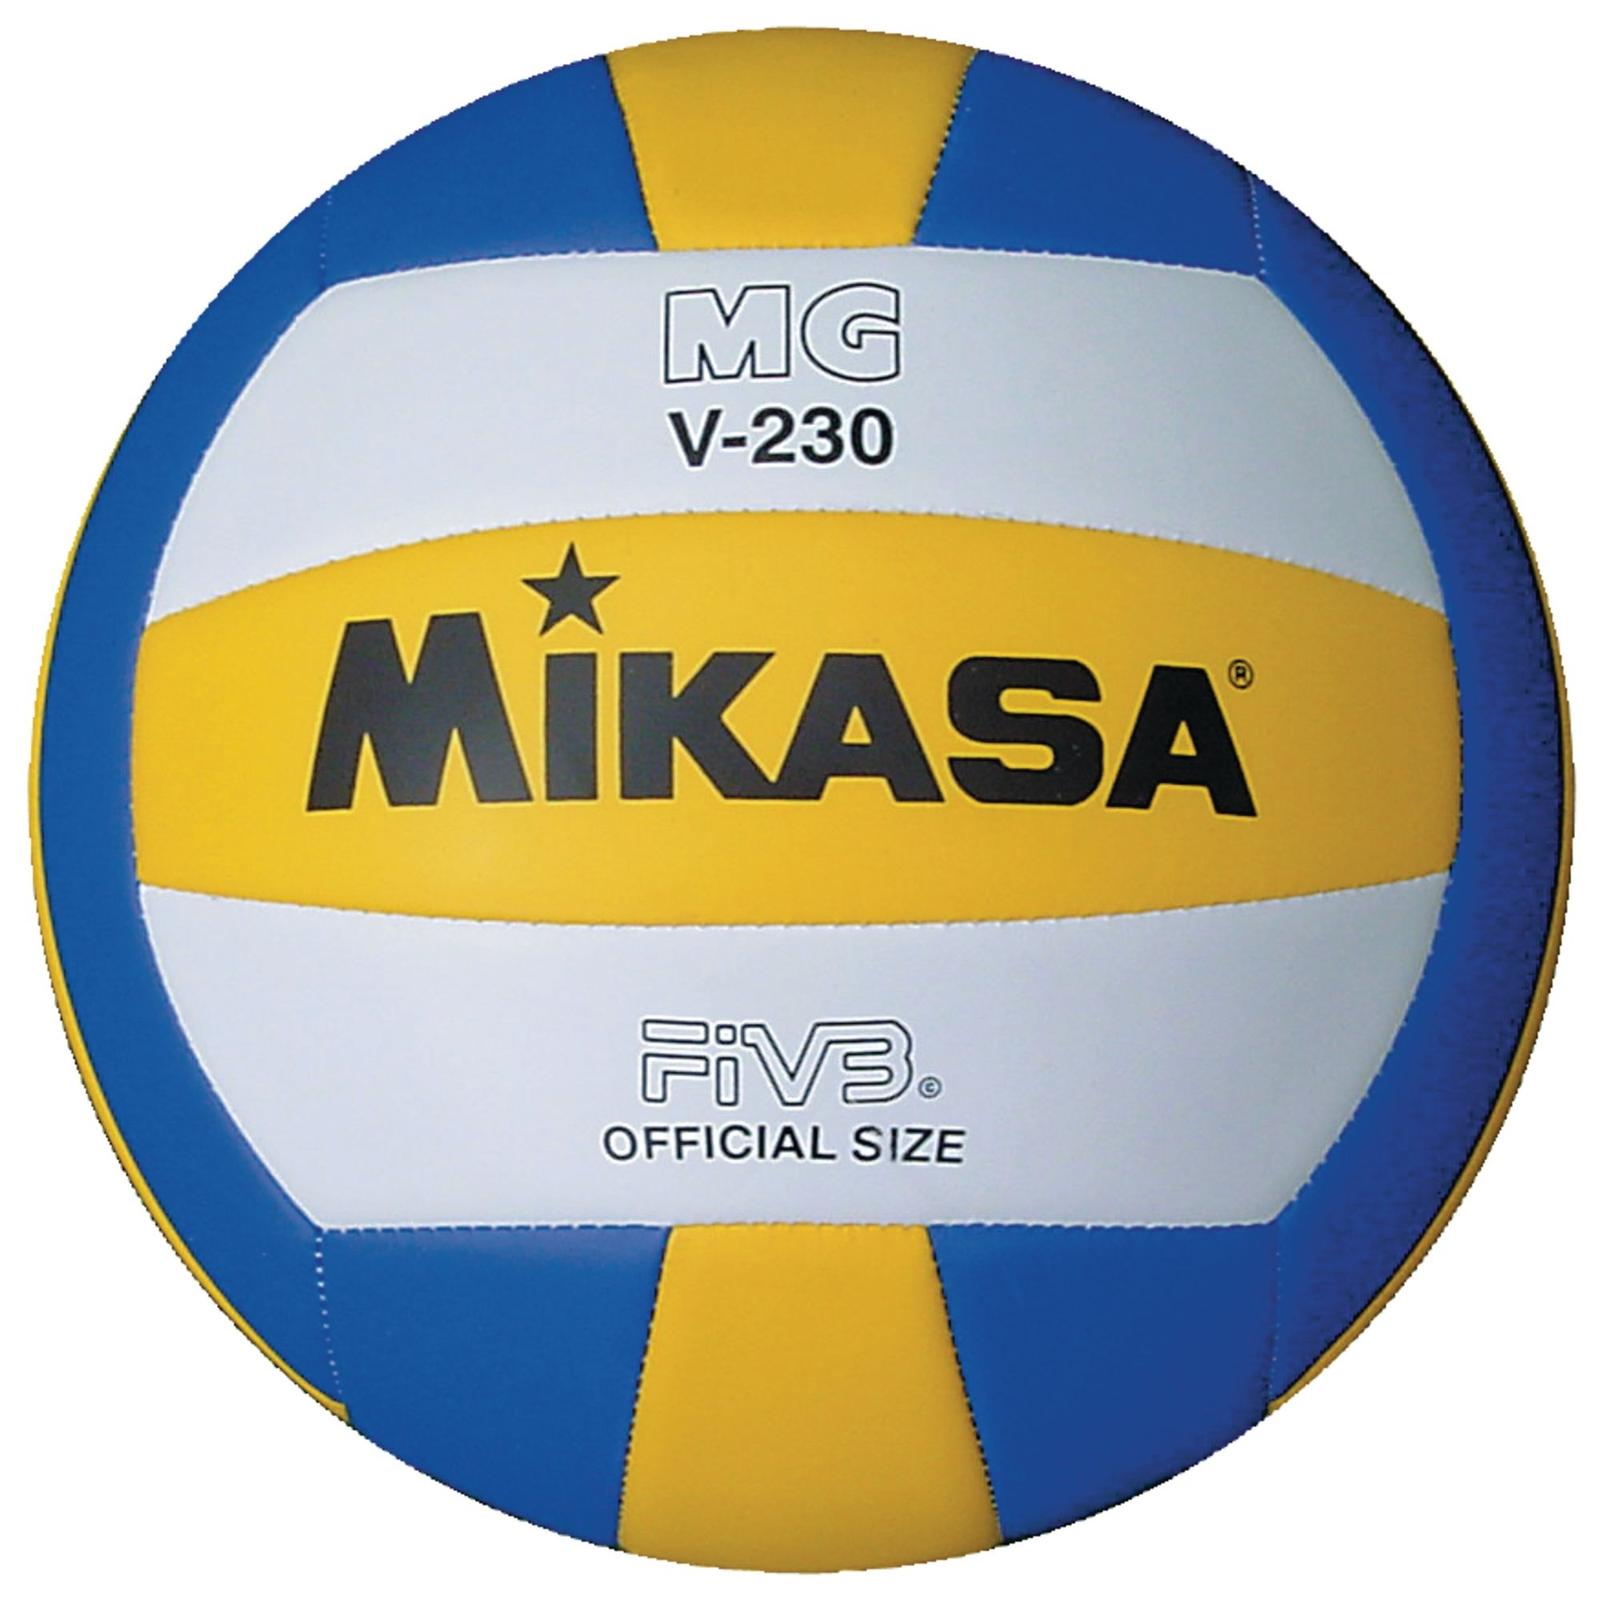 Mikasa MGV Volleyball - 230g